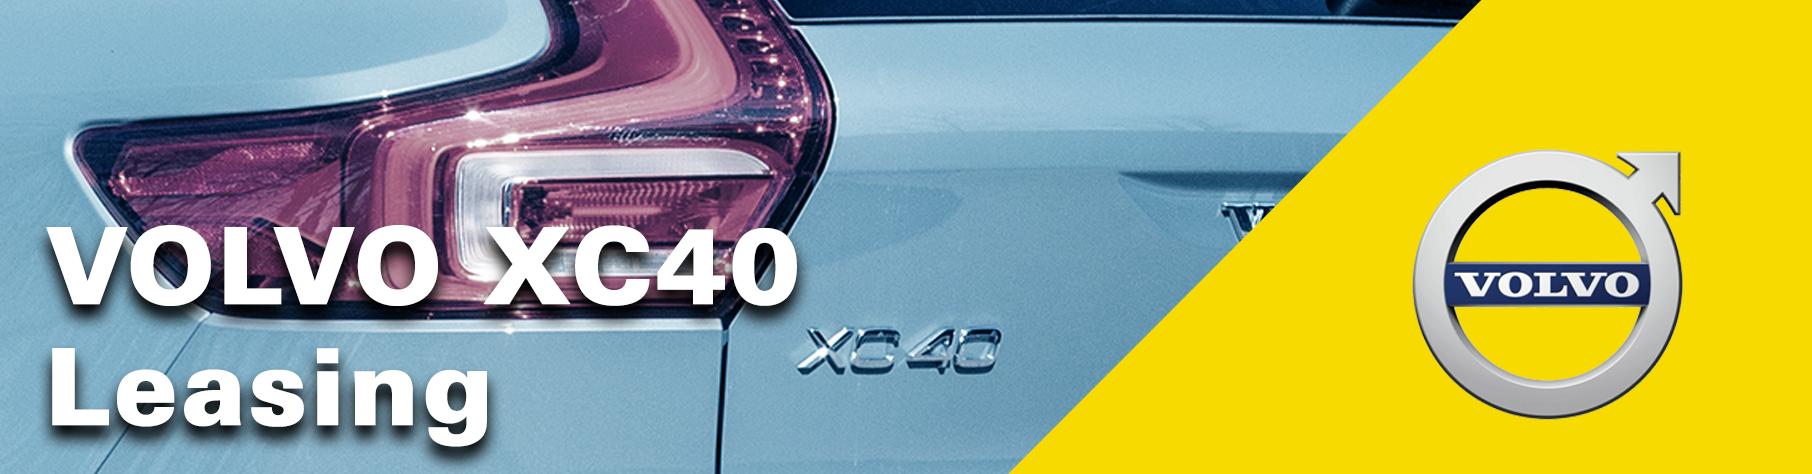 VOLVO XC40 Leasing - Momentum Pro - Begrenzte Stückzahl